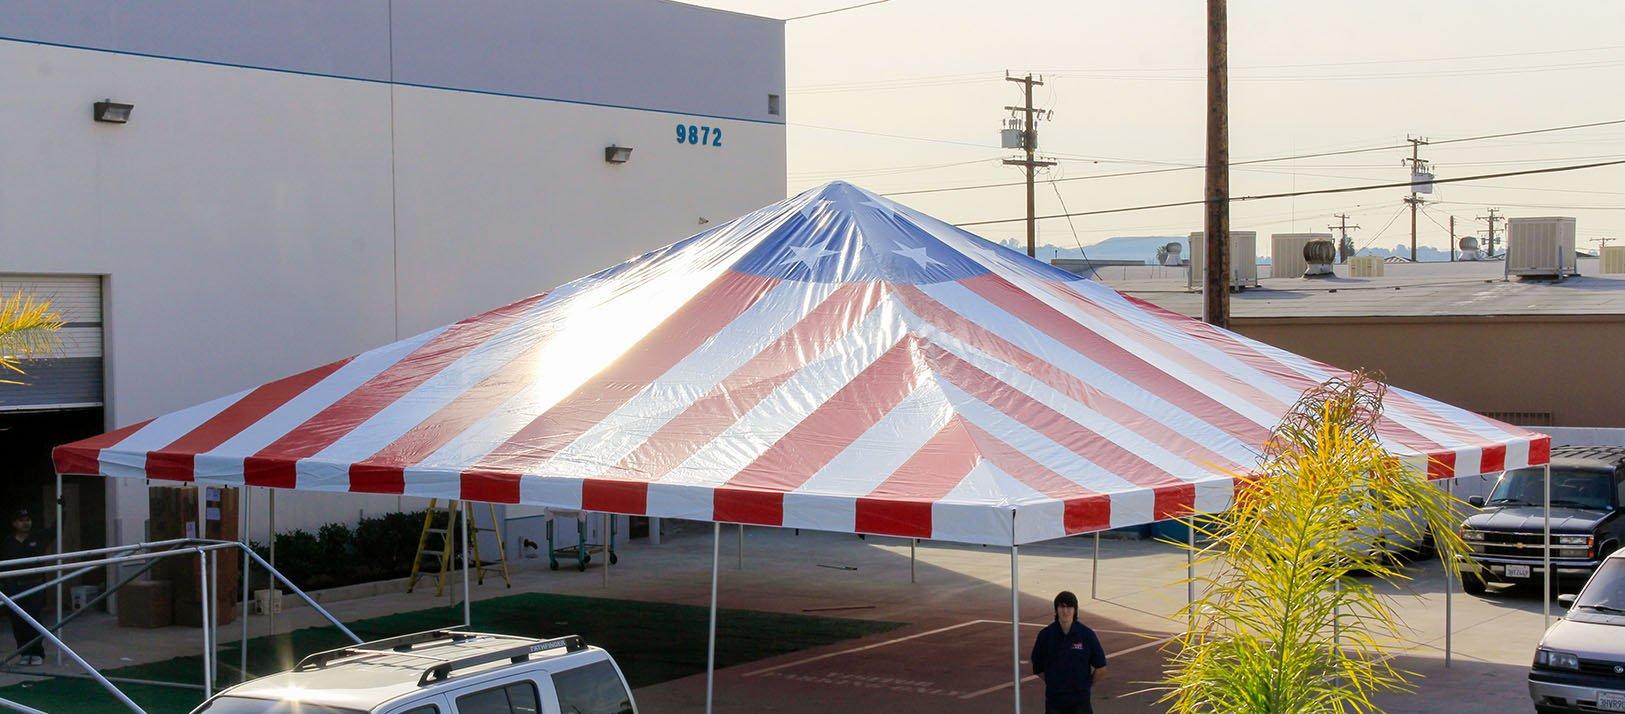 40x40-american-flag-frame-tent-header.jpg